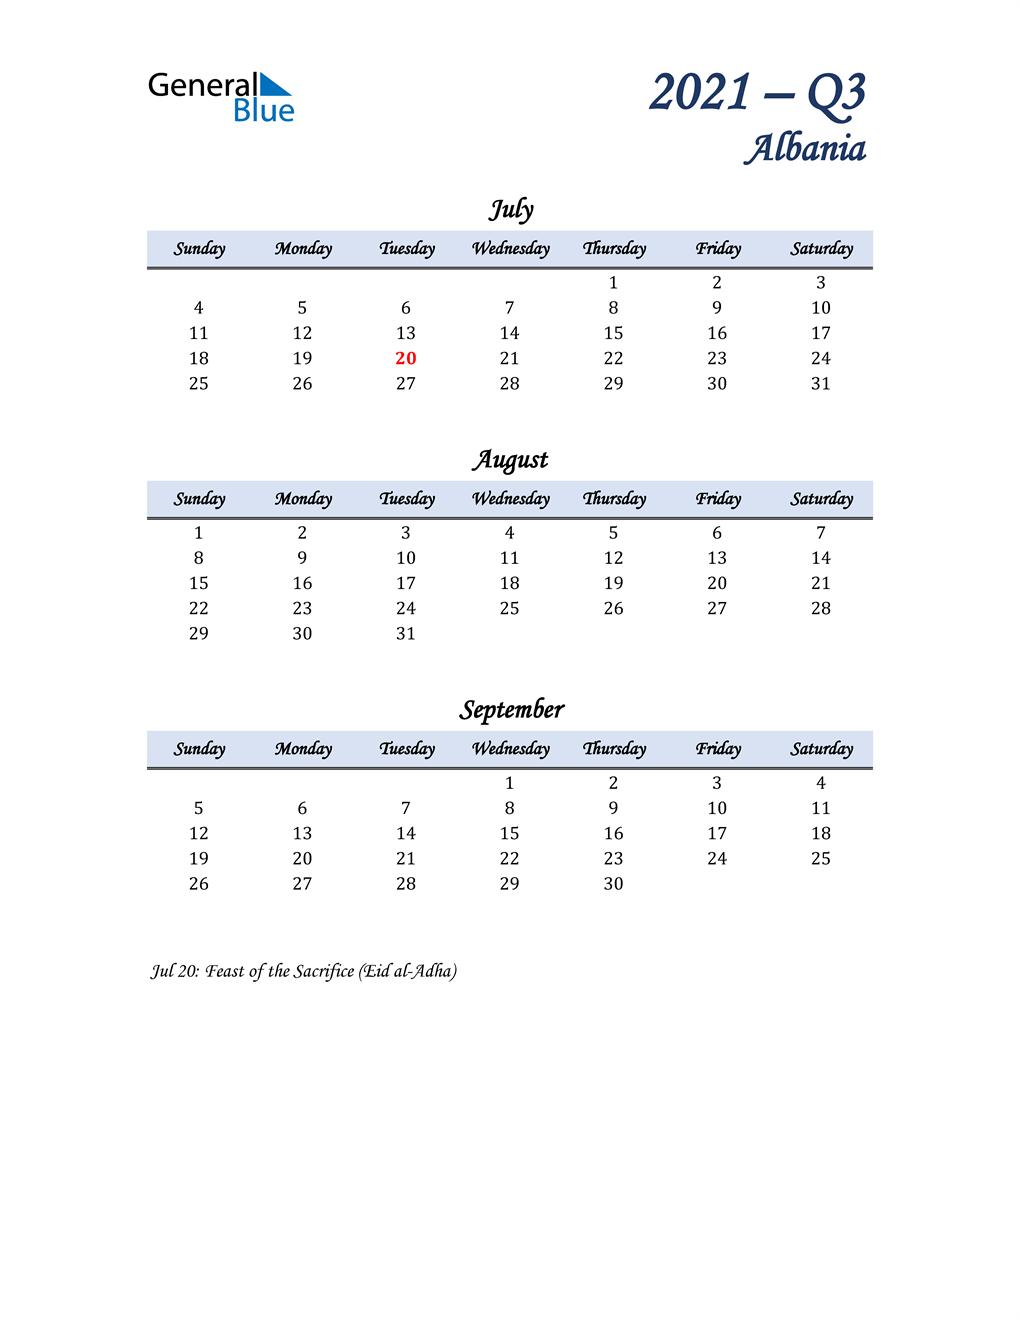 July, August, and September Calendar for Albania